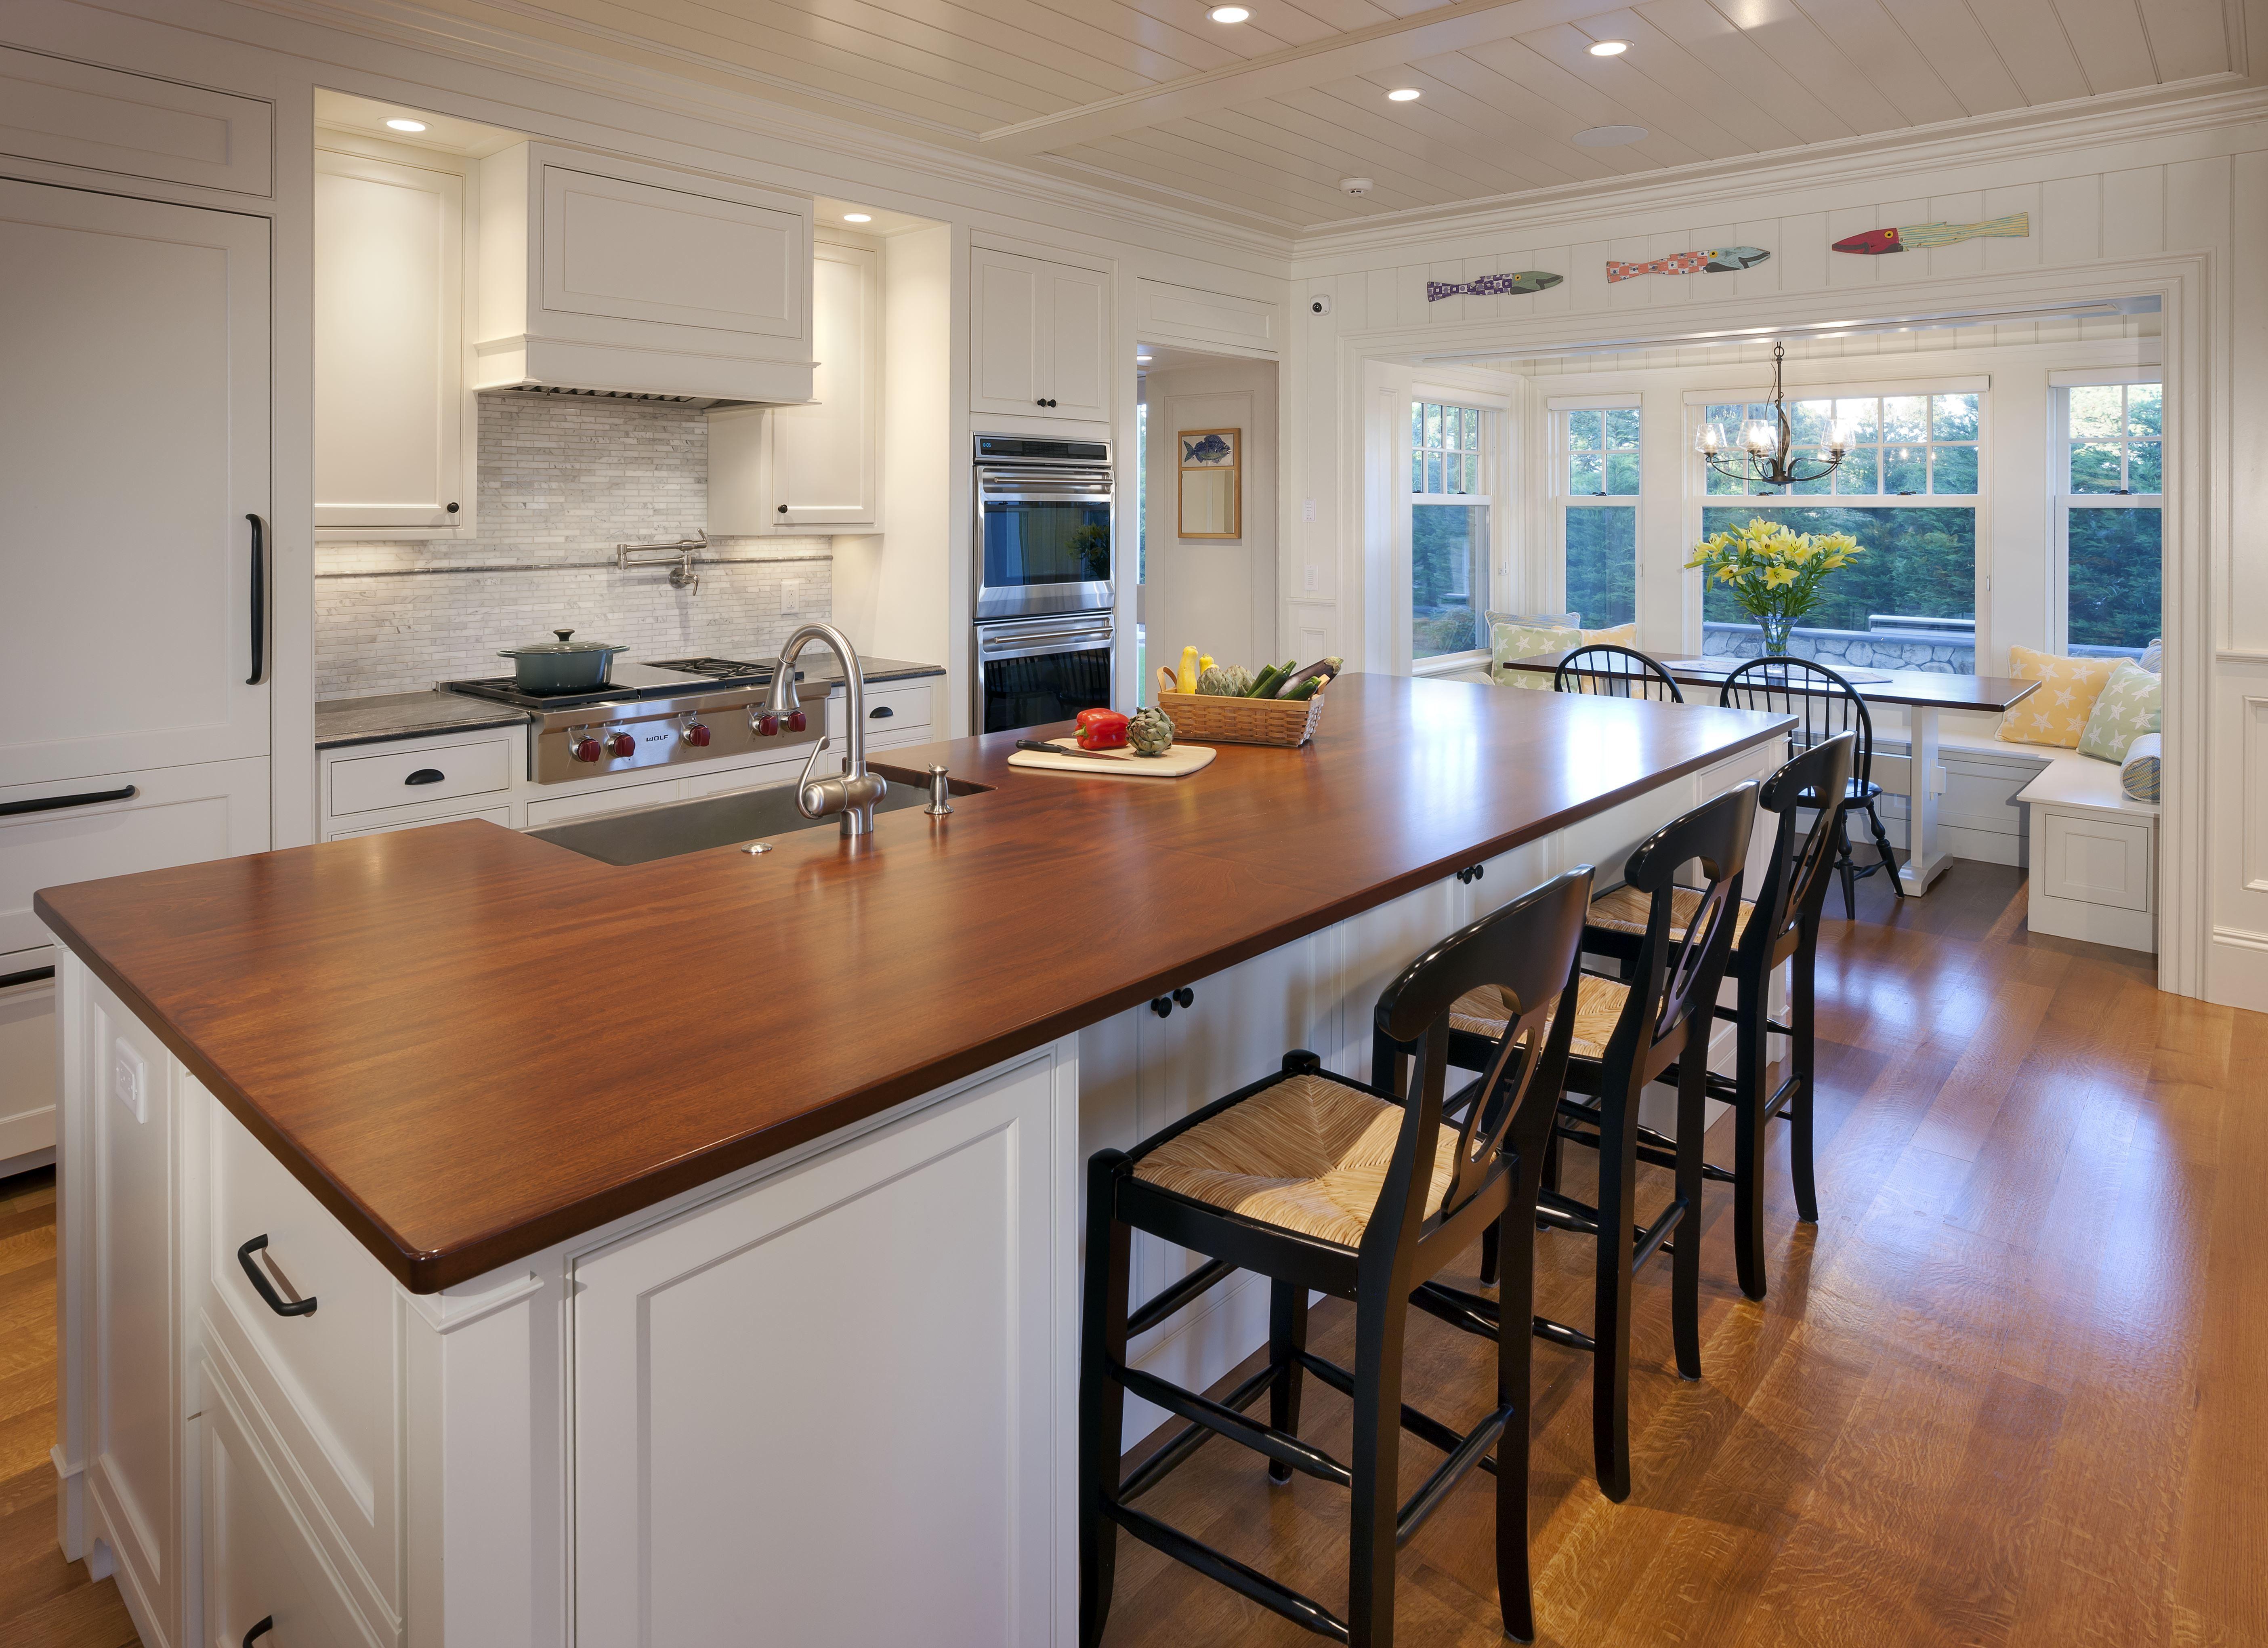 Remodeled Kitchens Photos Modern House Interior Design